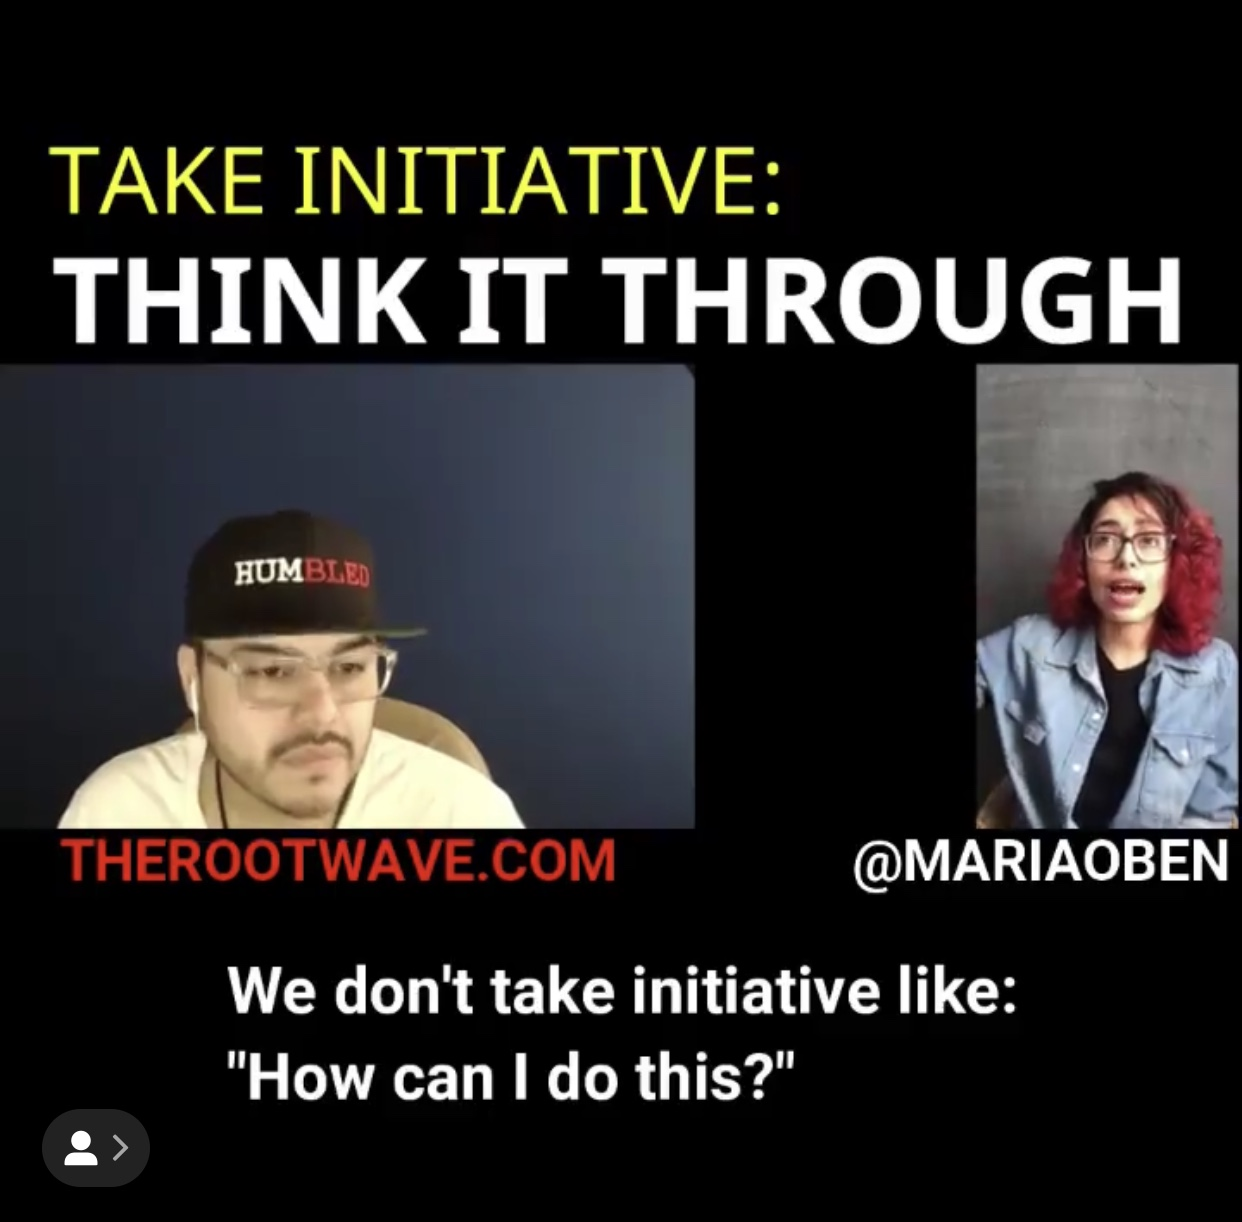 TAKE INITIATIVE - THINK IT THROUGH